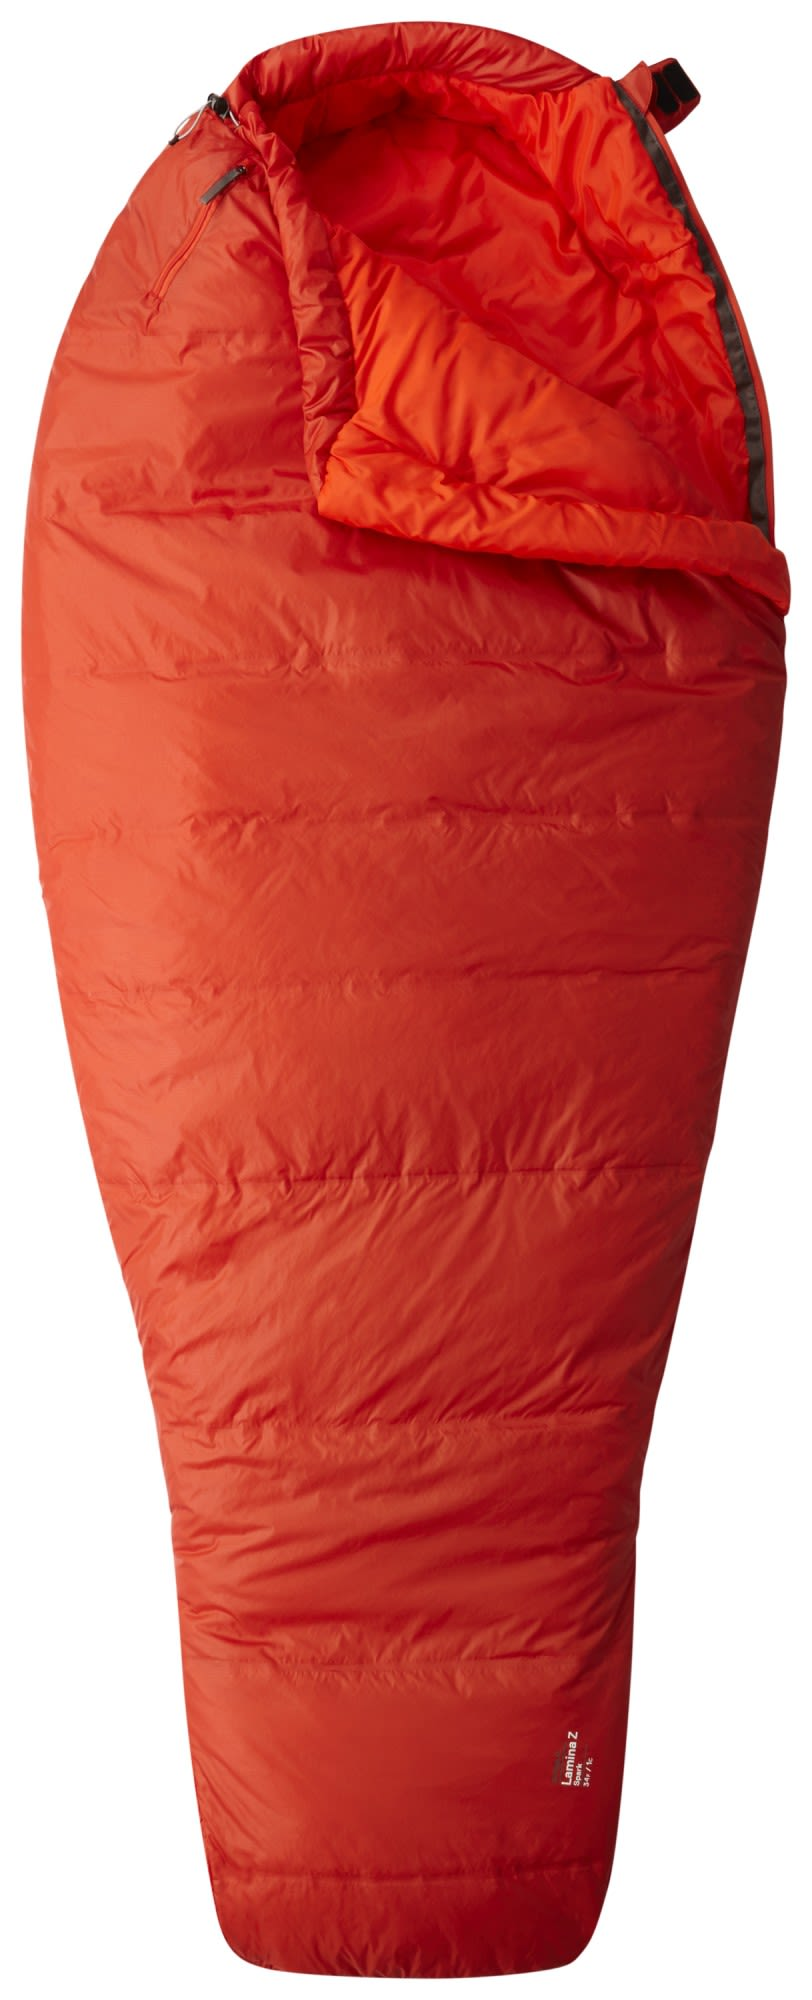 Mountain Hardwear Lamina Z Spark Regular Rot, 198 cm -RV links -Farbe Flame, 198